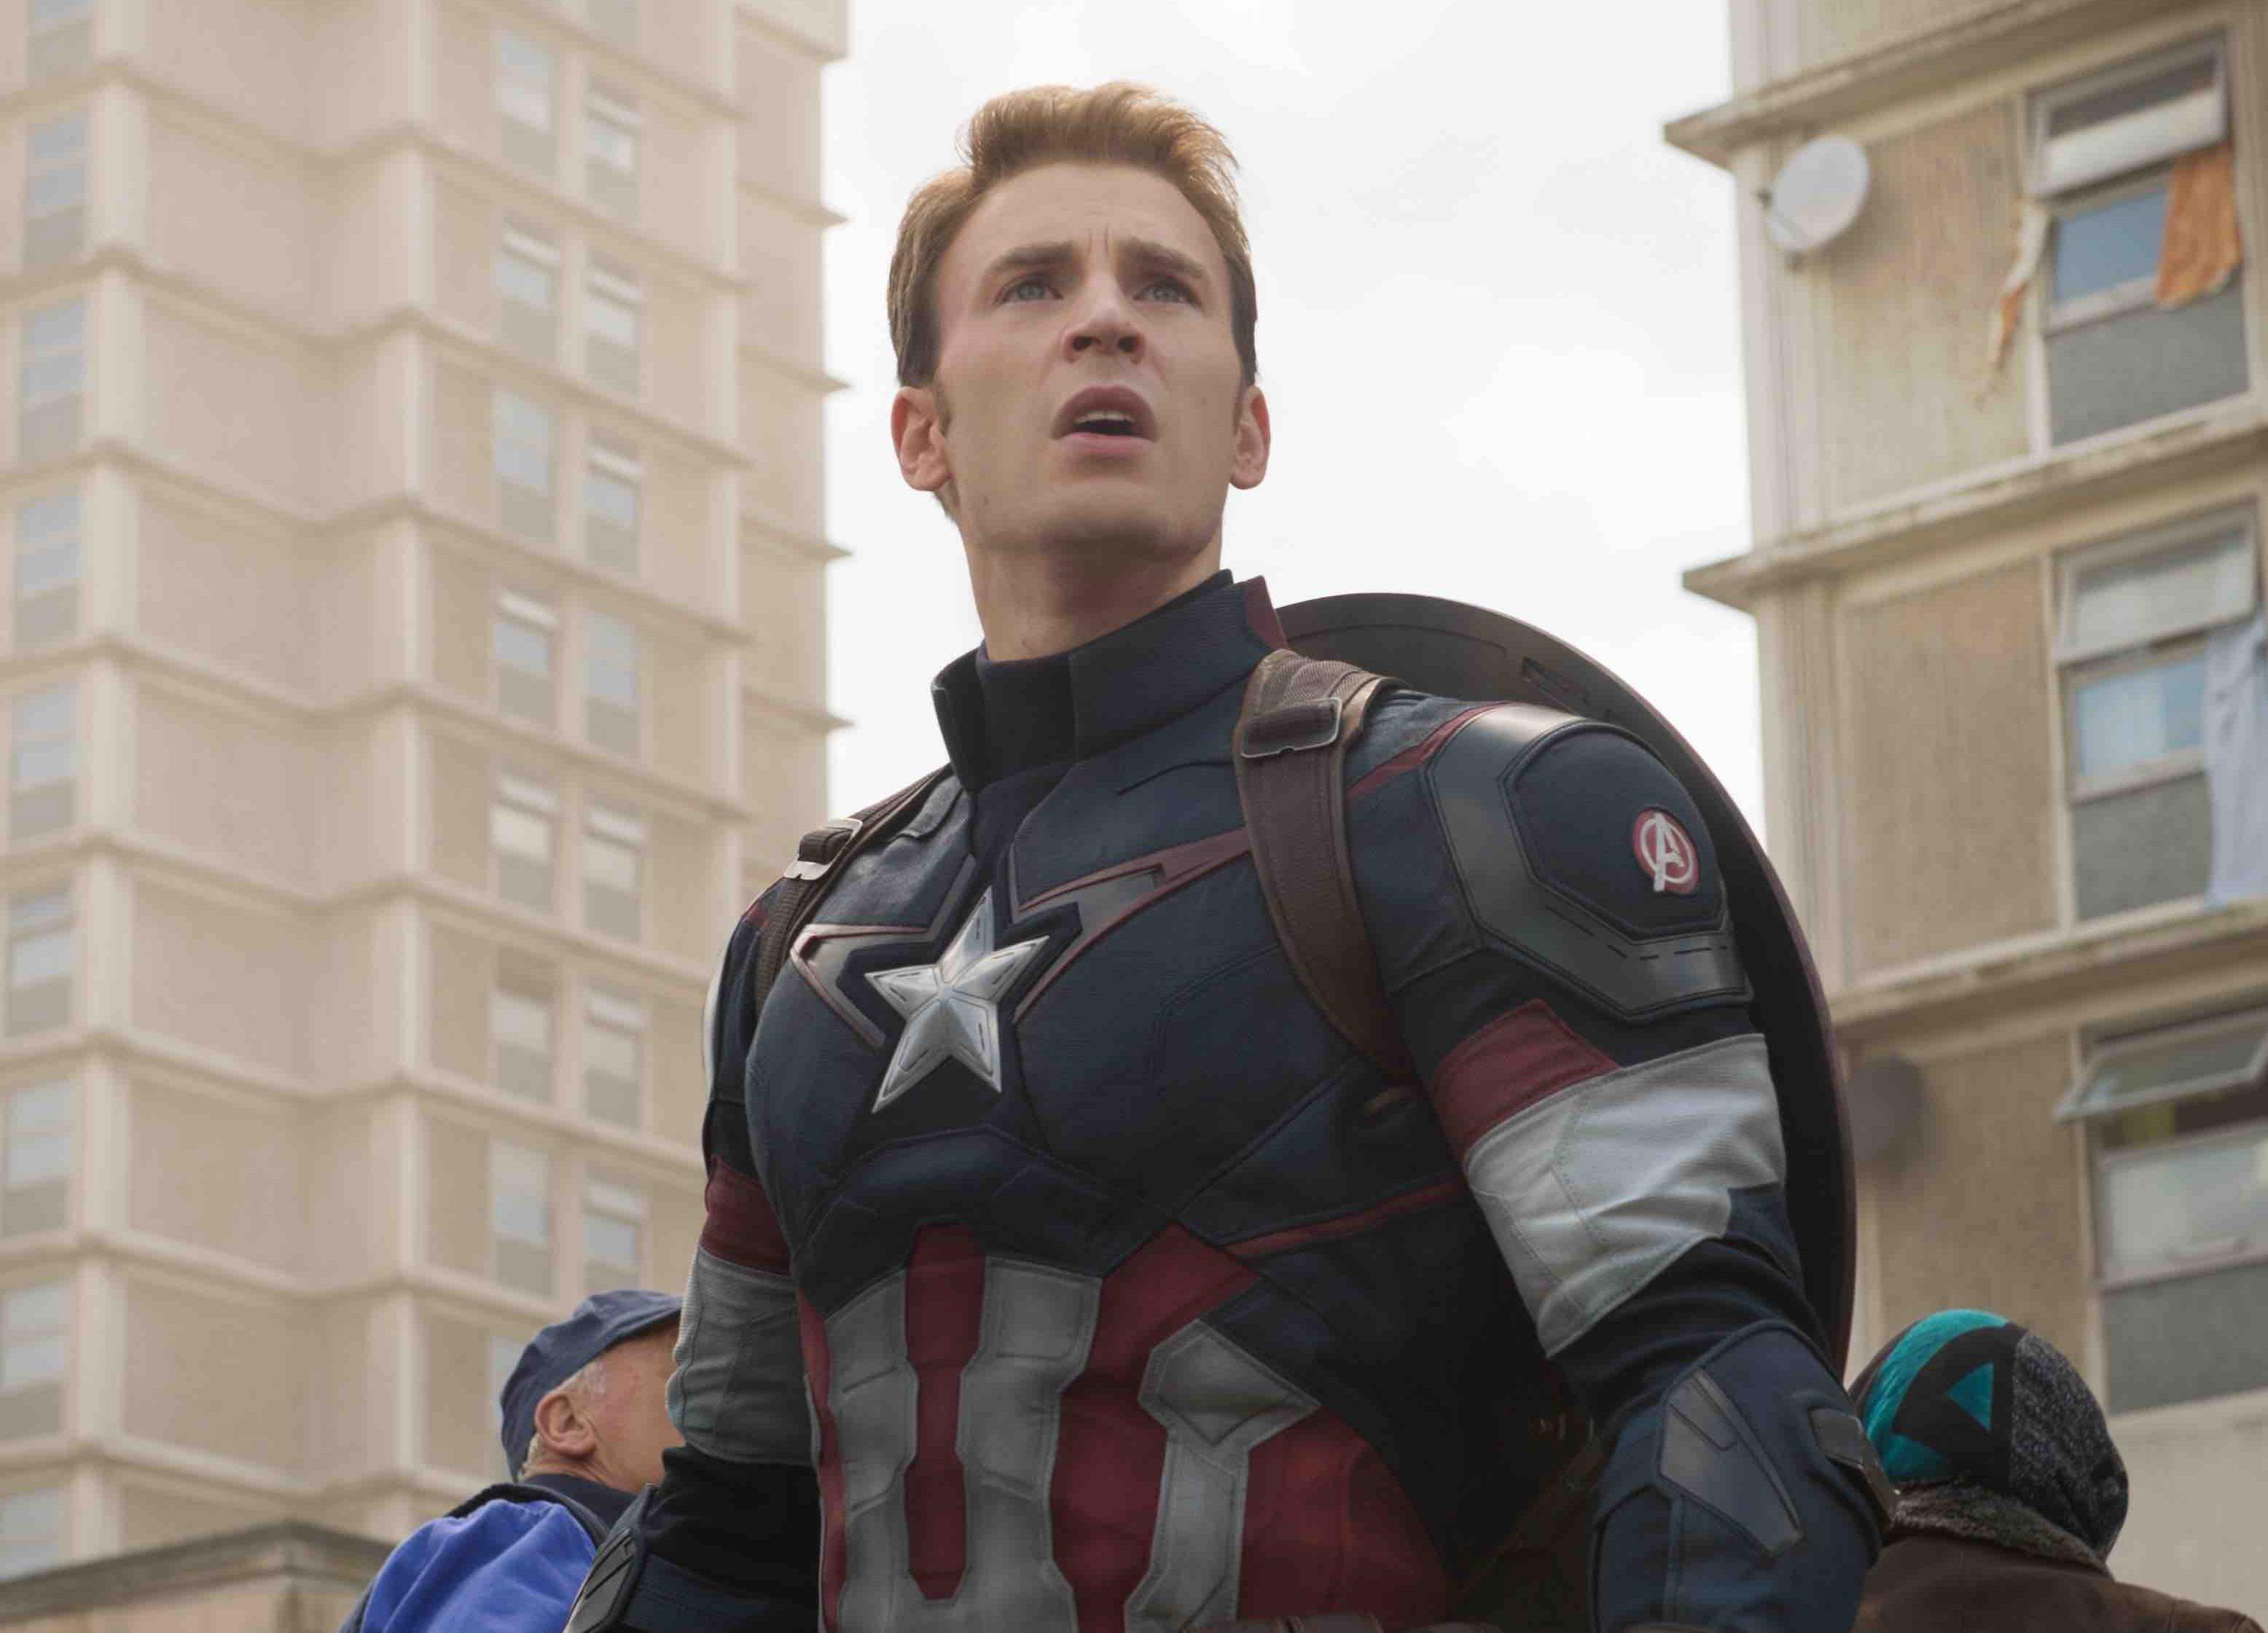 Капитан Америка станет доктором Джекиллом и мистером Хайдом